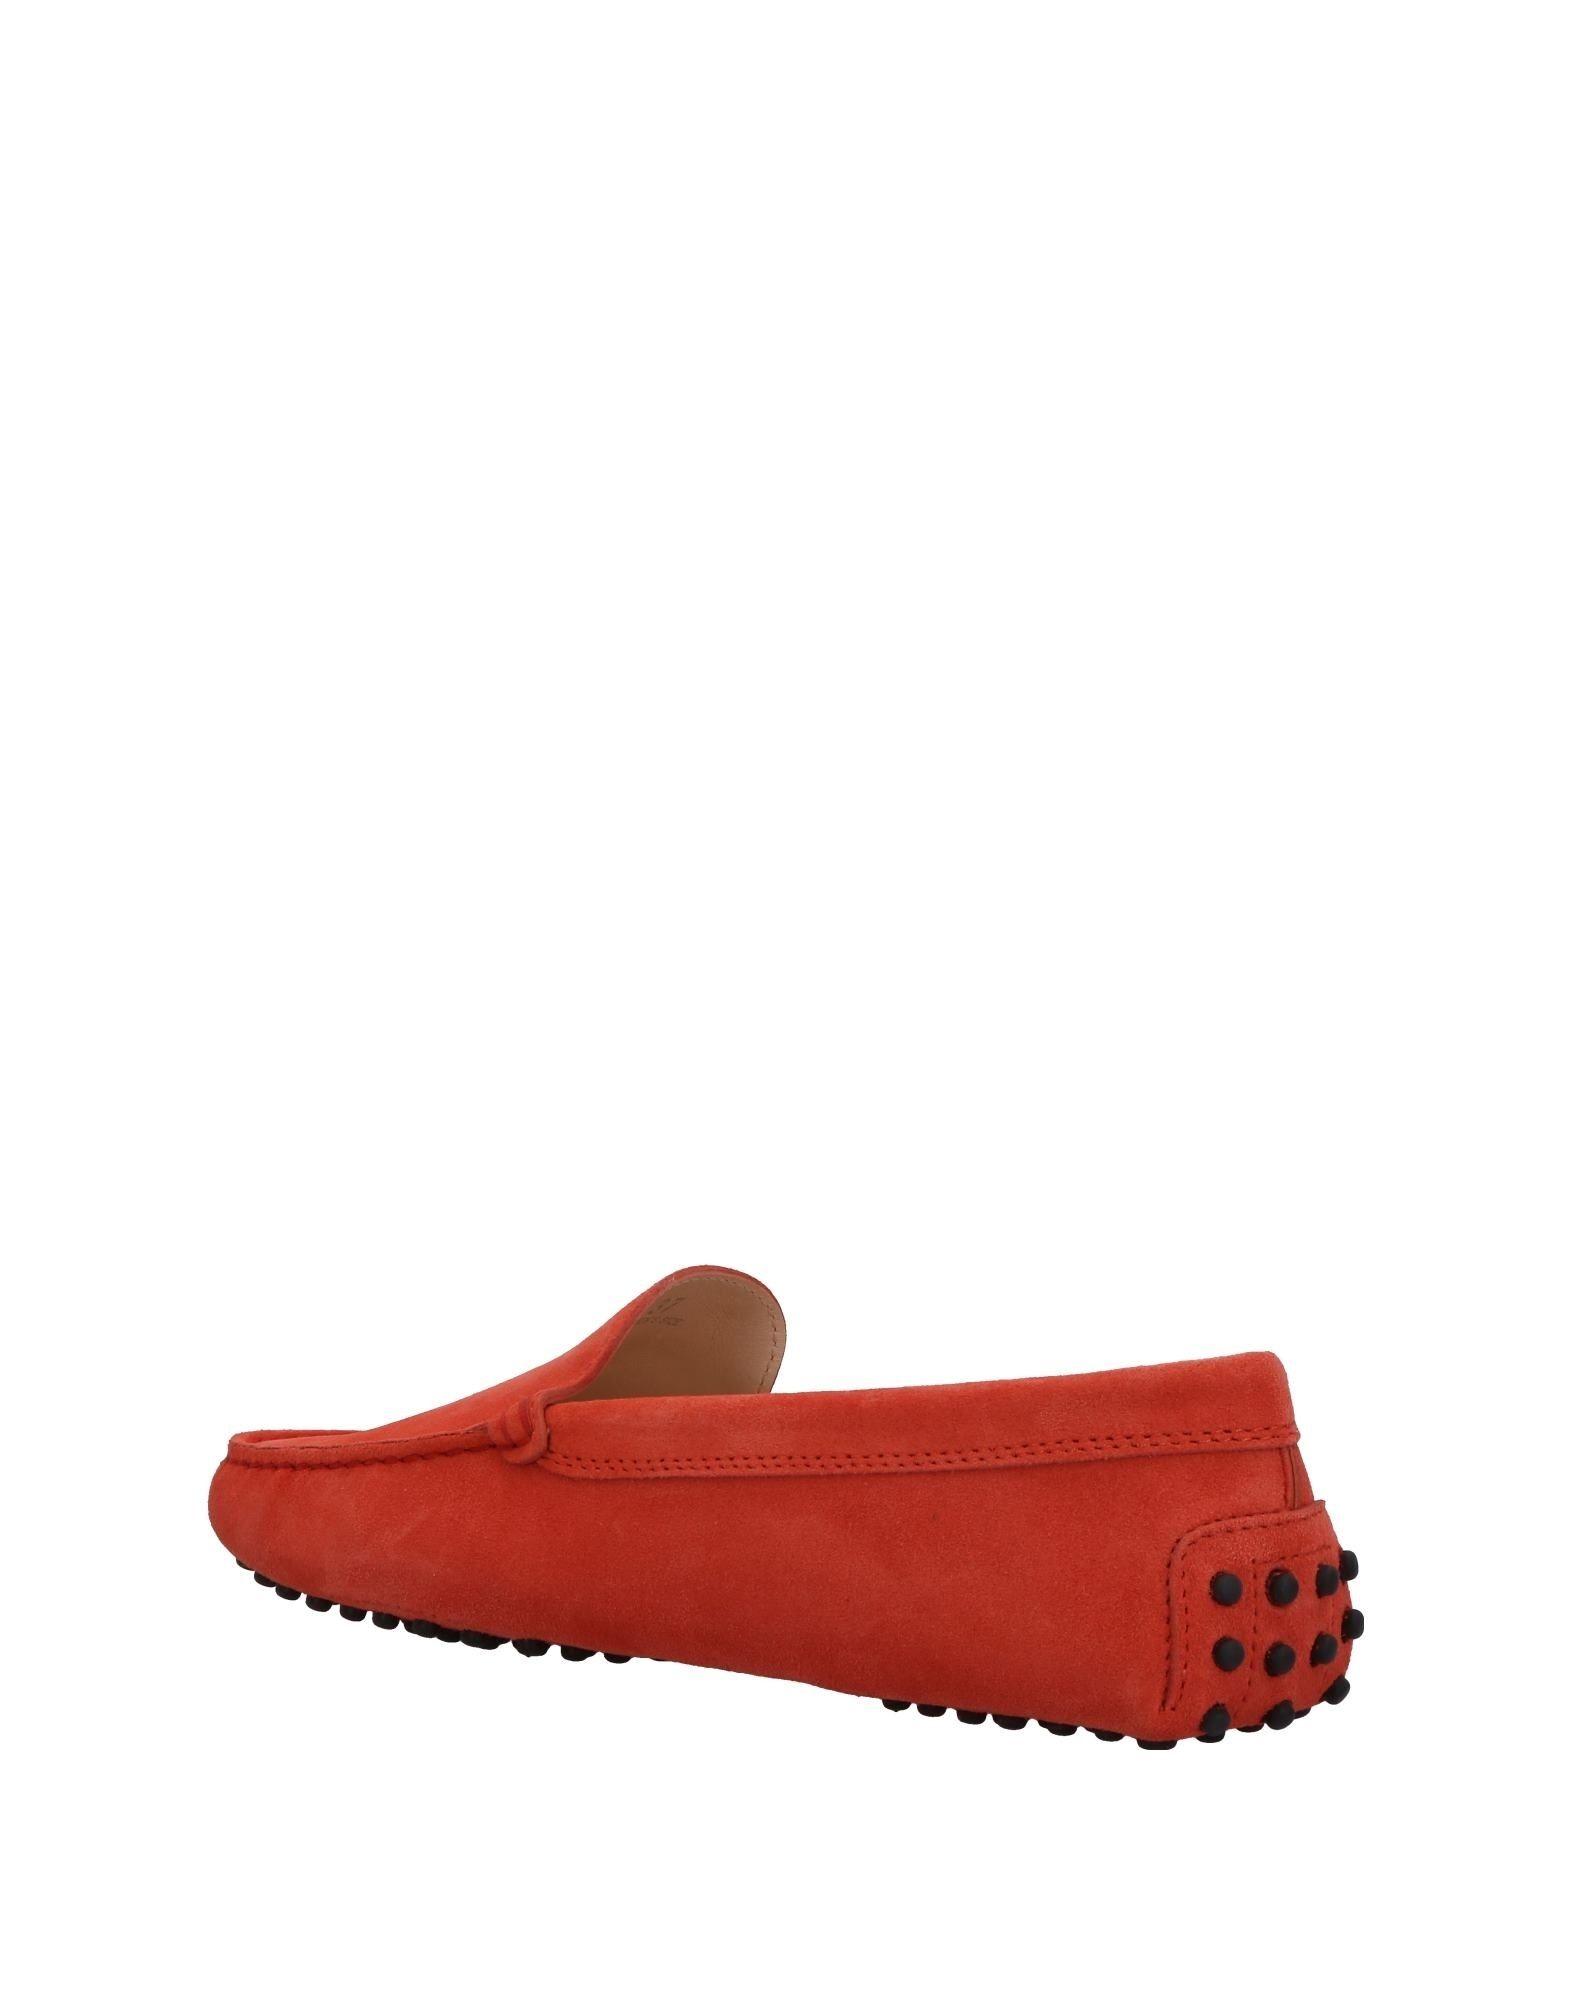 Tod's Mokassins Damen  11396474PWGut Schuhe aussehende strapazierfähige Schuhe 11396474PWGut 7b9457